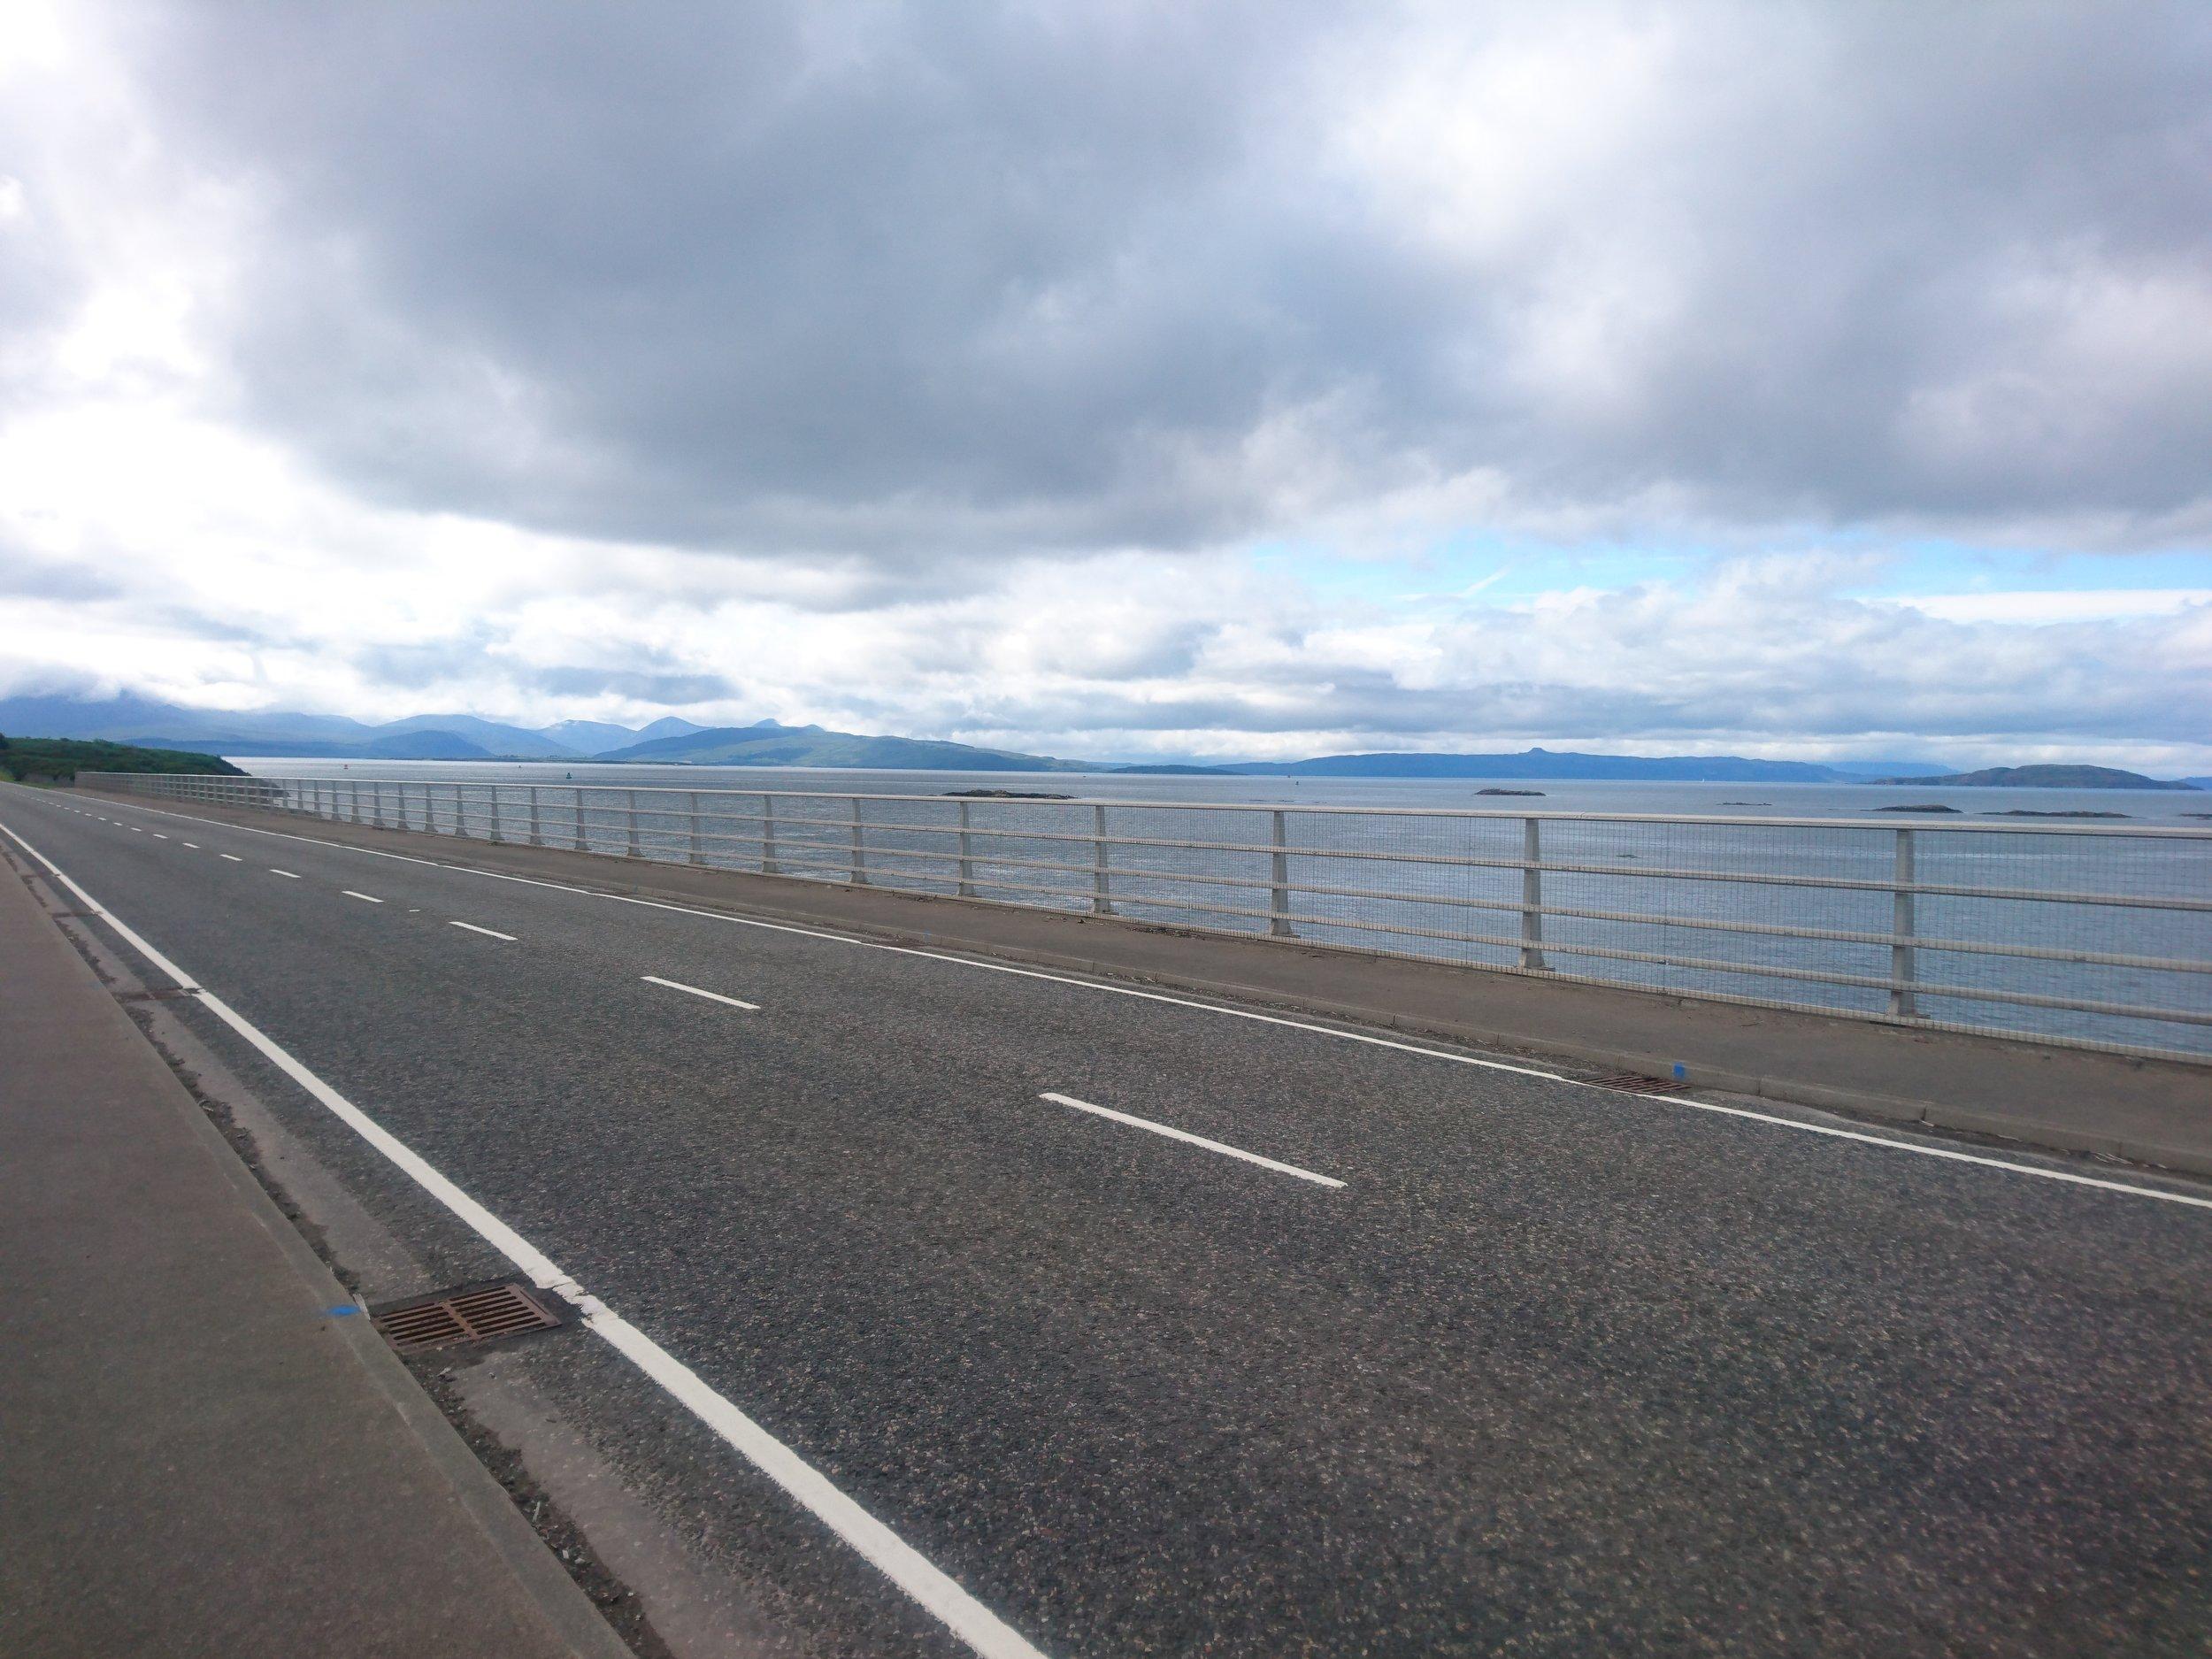 Skye Bridge (First Part)